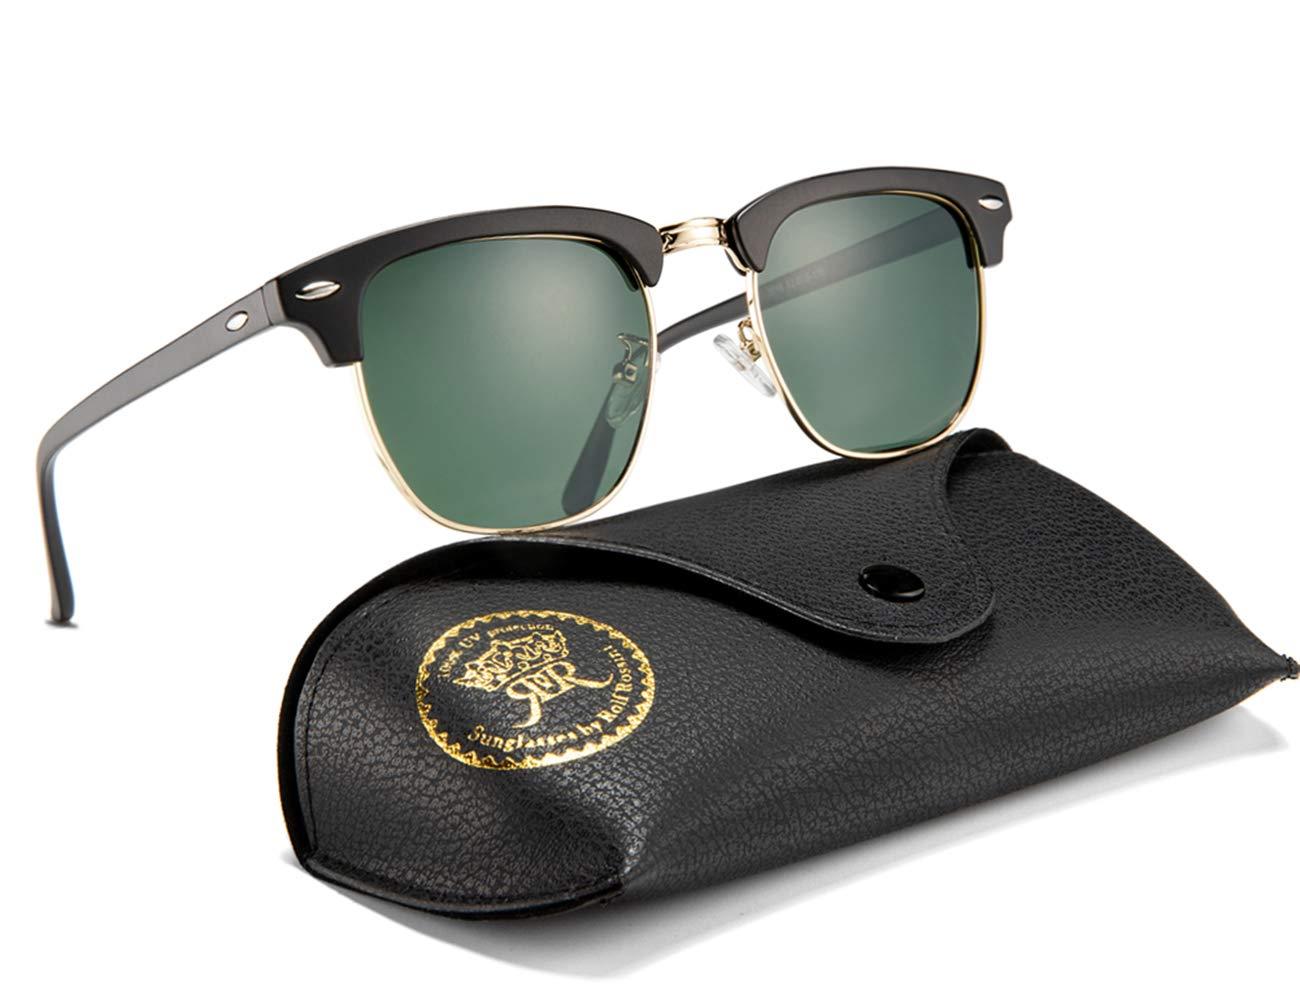 Mens Sunglasses Polarized Retro Classic Semi Rimless Sun Glasses for Women Vintage UV400 Protection With Case (Black, Green) by Rocf Rossini